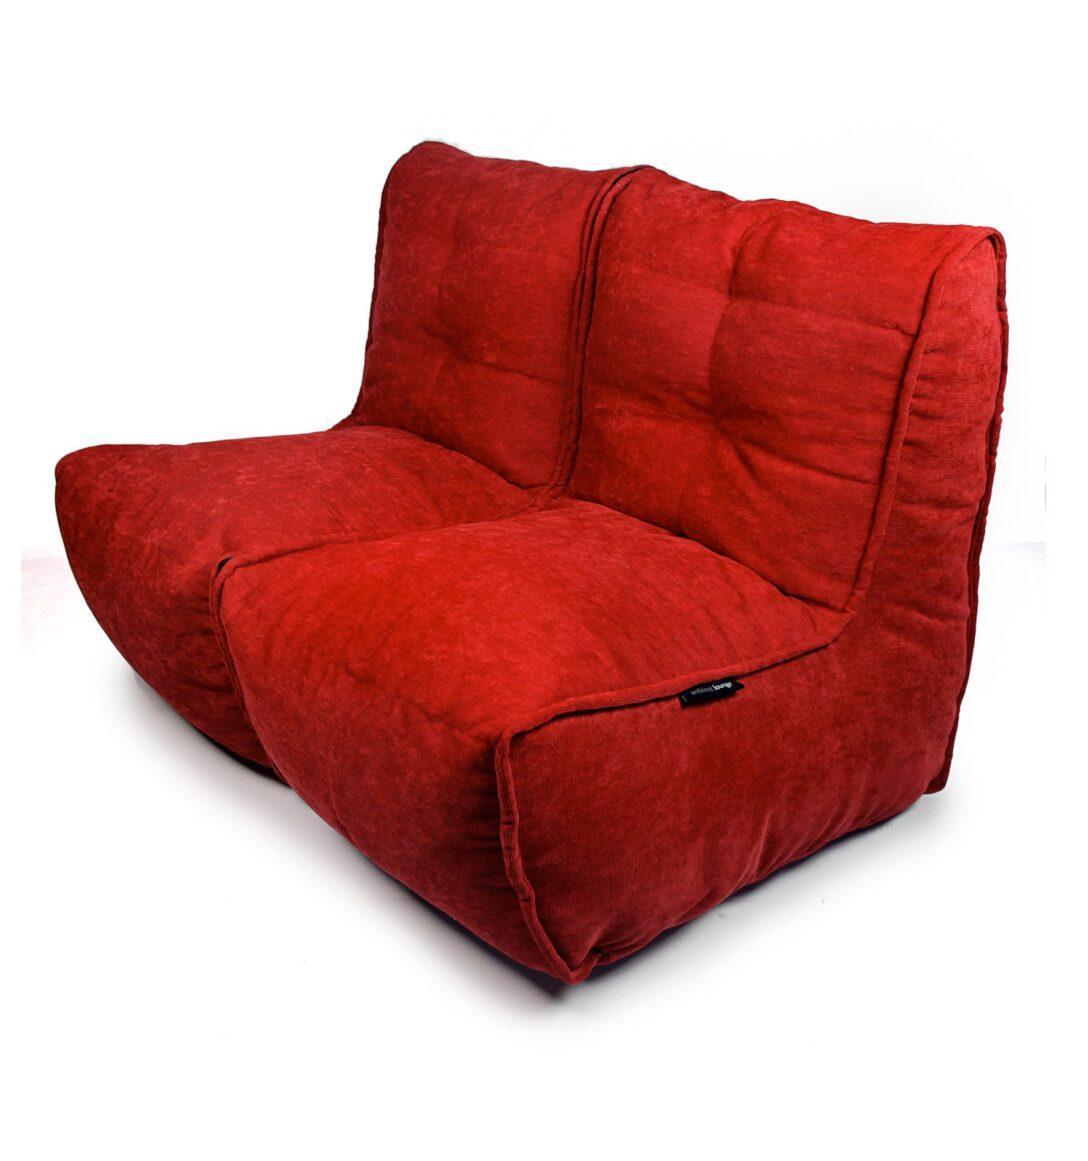 Large Size of Sitzsack Sofa Twin Wildberry Red Ambientyou Grau Stoff Esszimmer Großes U Form Kunstleder Big Günstig Halbrund Hussen Ohne Lehne Für Schilling Günstige Sofa Sitzsack Sofa